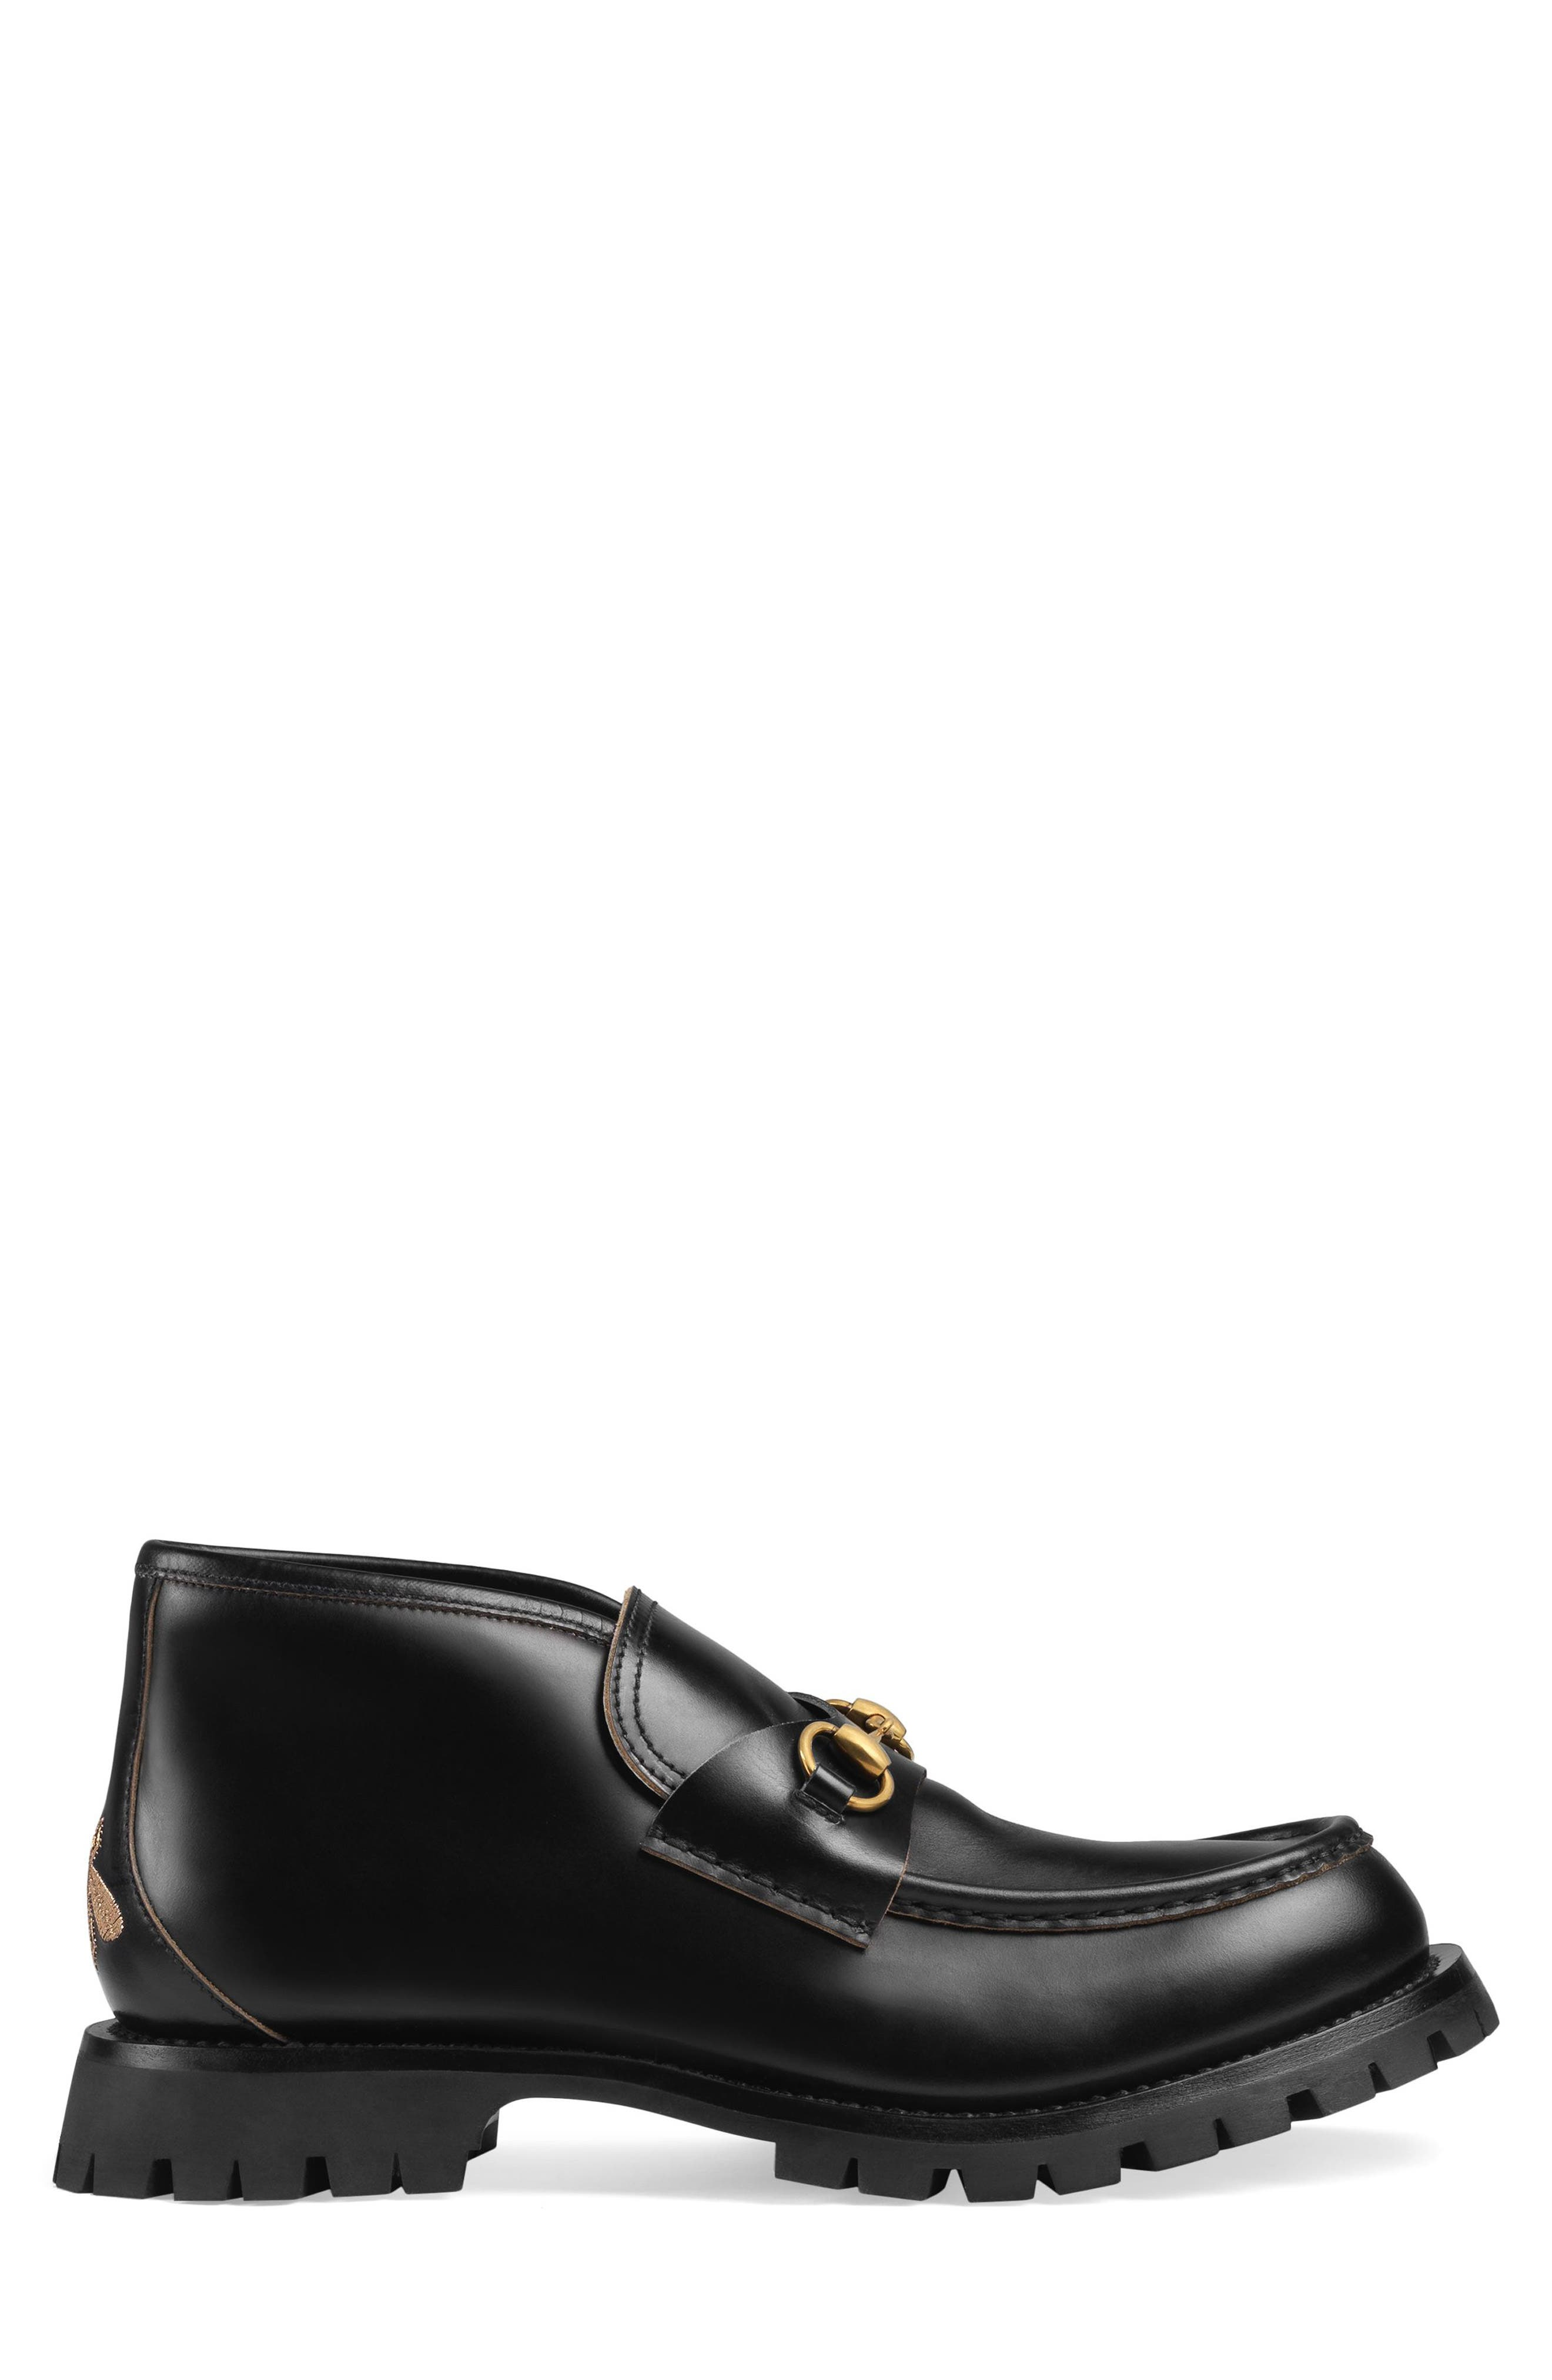 5a7e1a0fcca Men s Gucci Chukka Boots